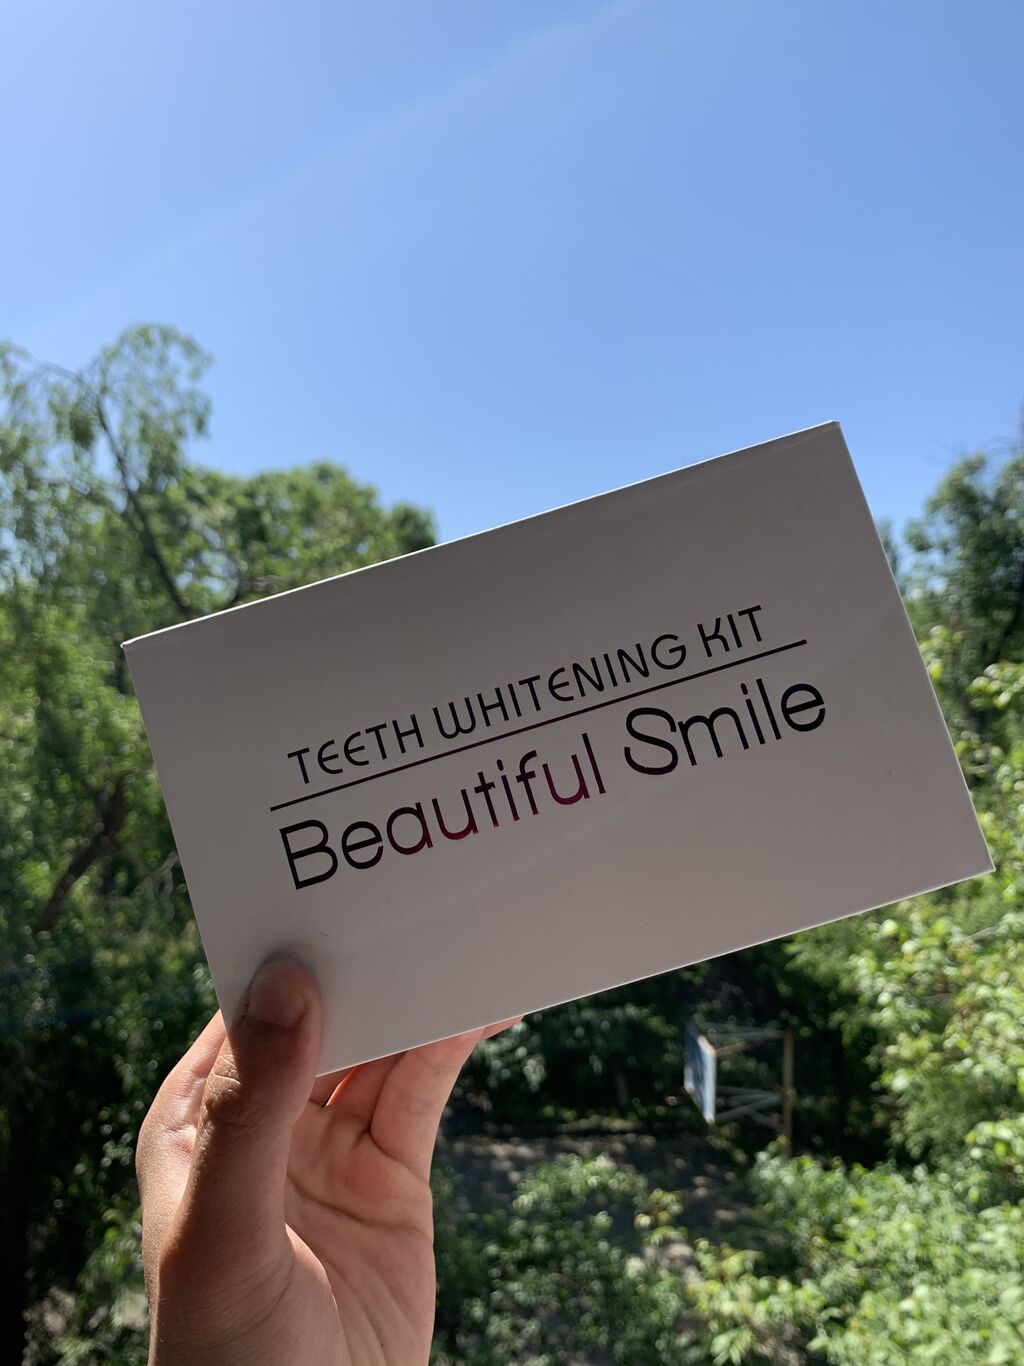 Здравствуйте, представляю Вам наш фирменный товар Beautiful Smile